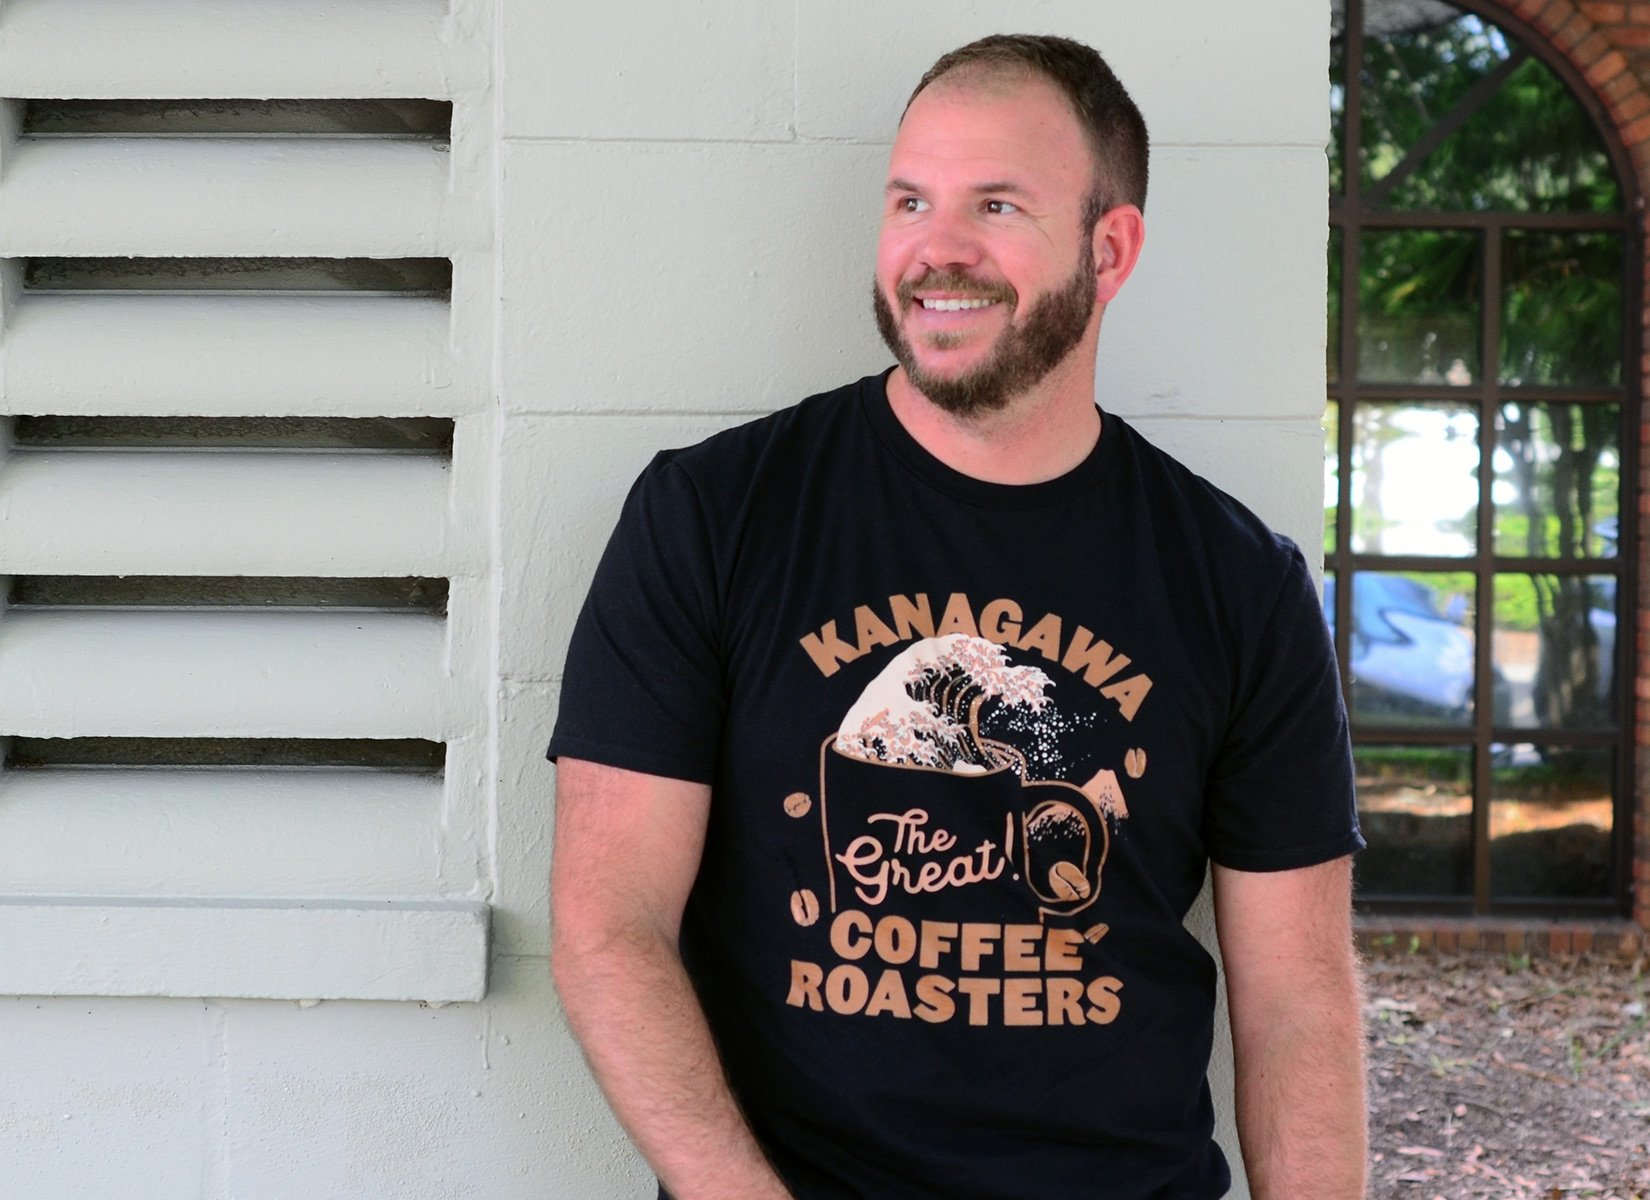 Kanagawa Coffee Roasters on Mens T-Shirt